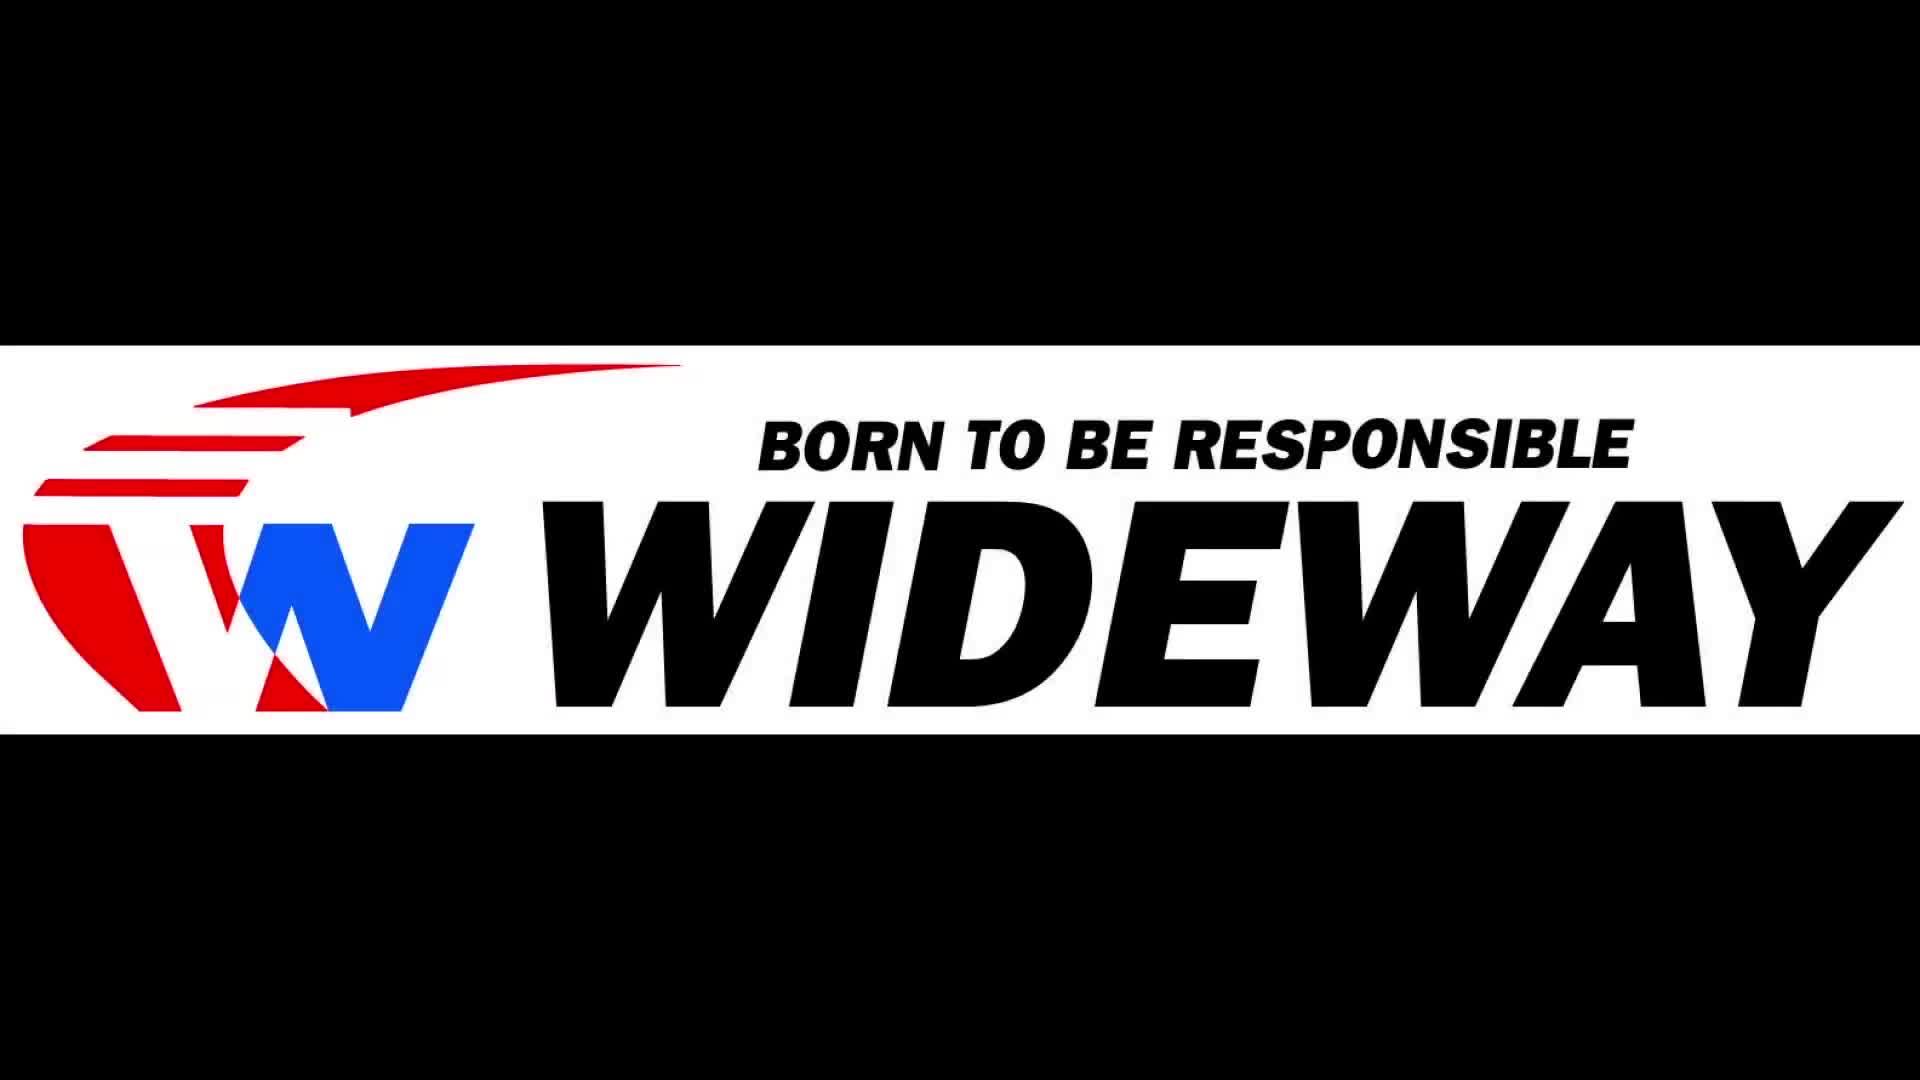 Wideway إطارات سيارات الركوب 195r14c مع ECE ، دول مجلس التعاون الخليجي ، DOT ، REACH ، تسمية الاتحاد الأوروبي